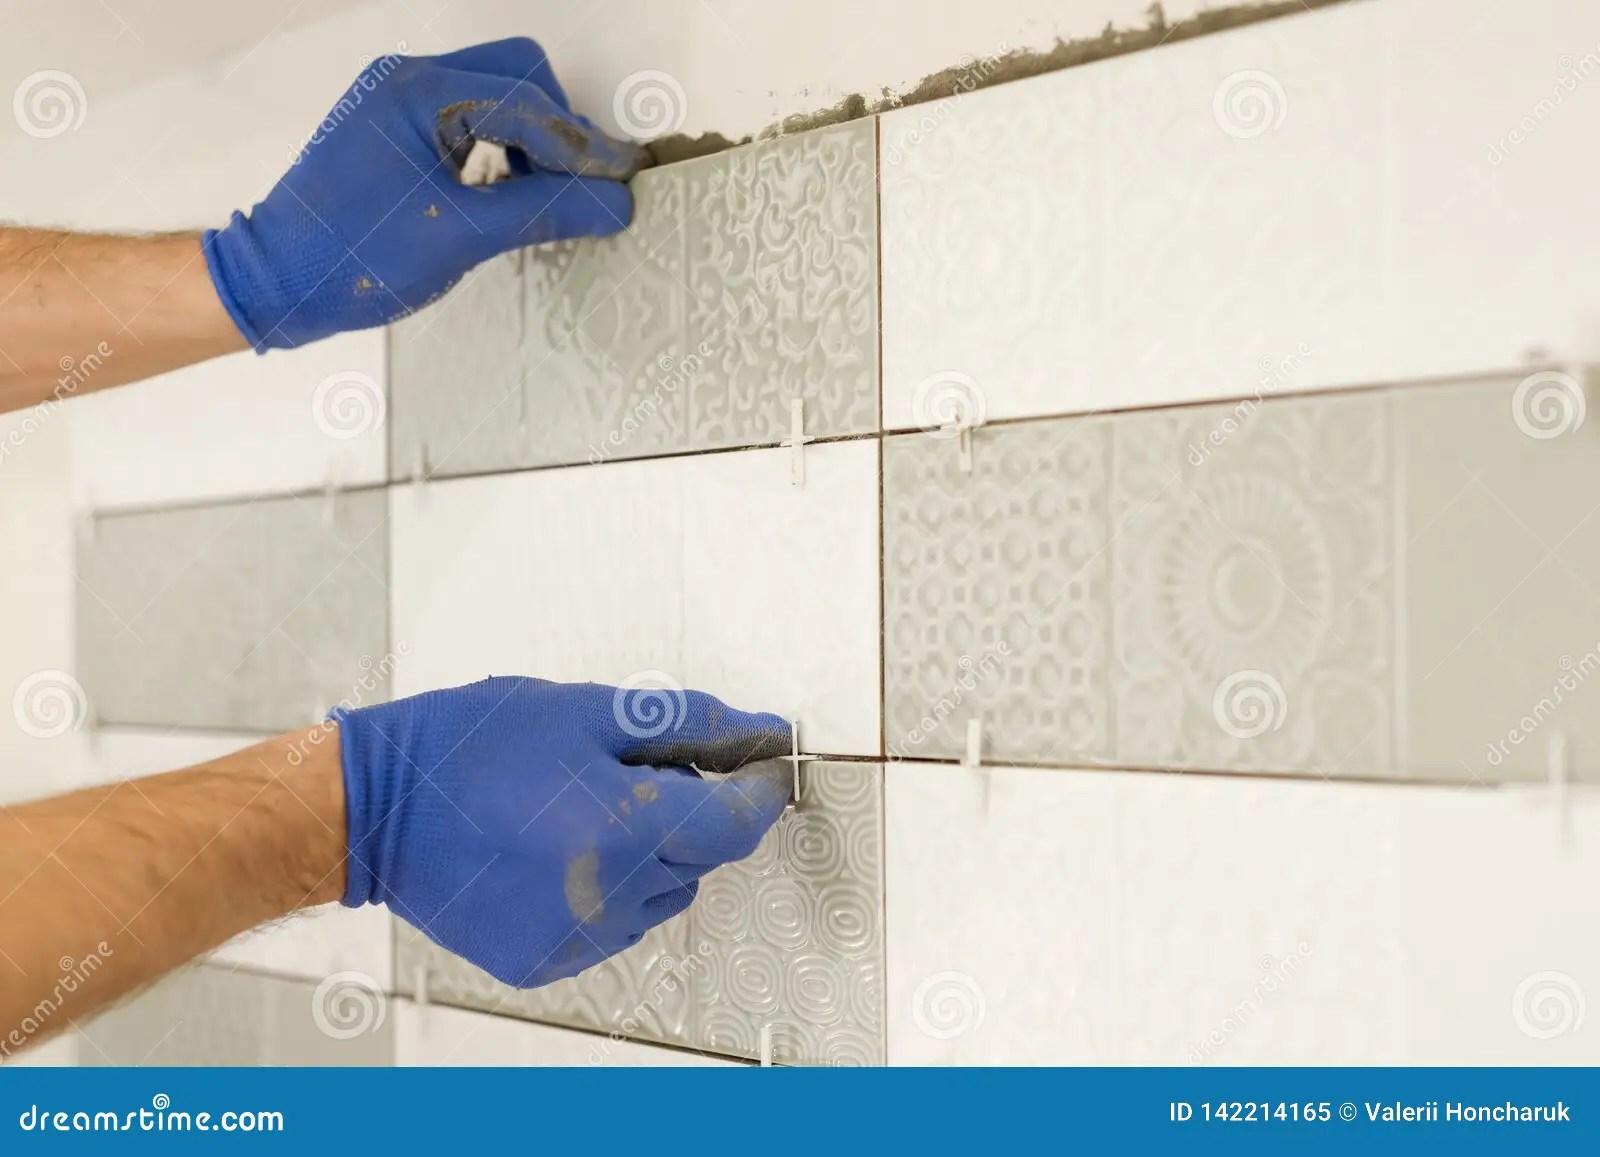 https www dreamstime com installing ceramic tiles wall kitchen placing tile spacers hands renovation repair construction image142214165